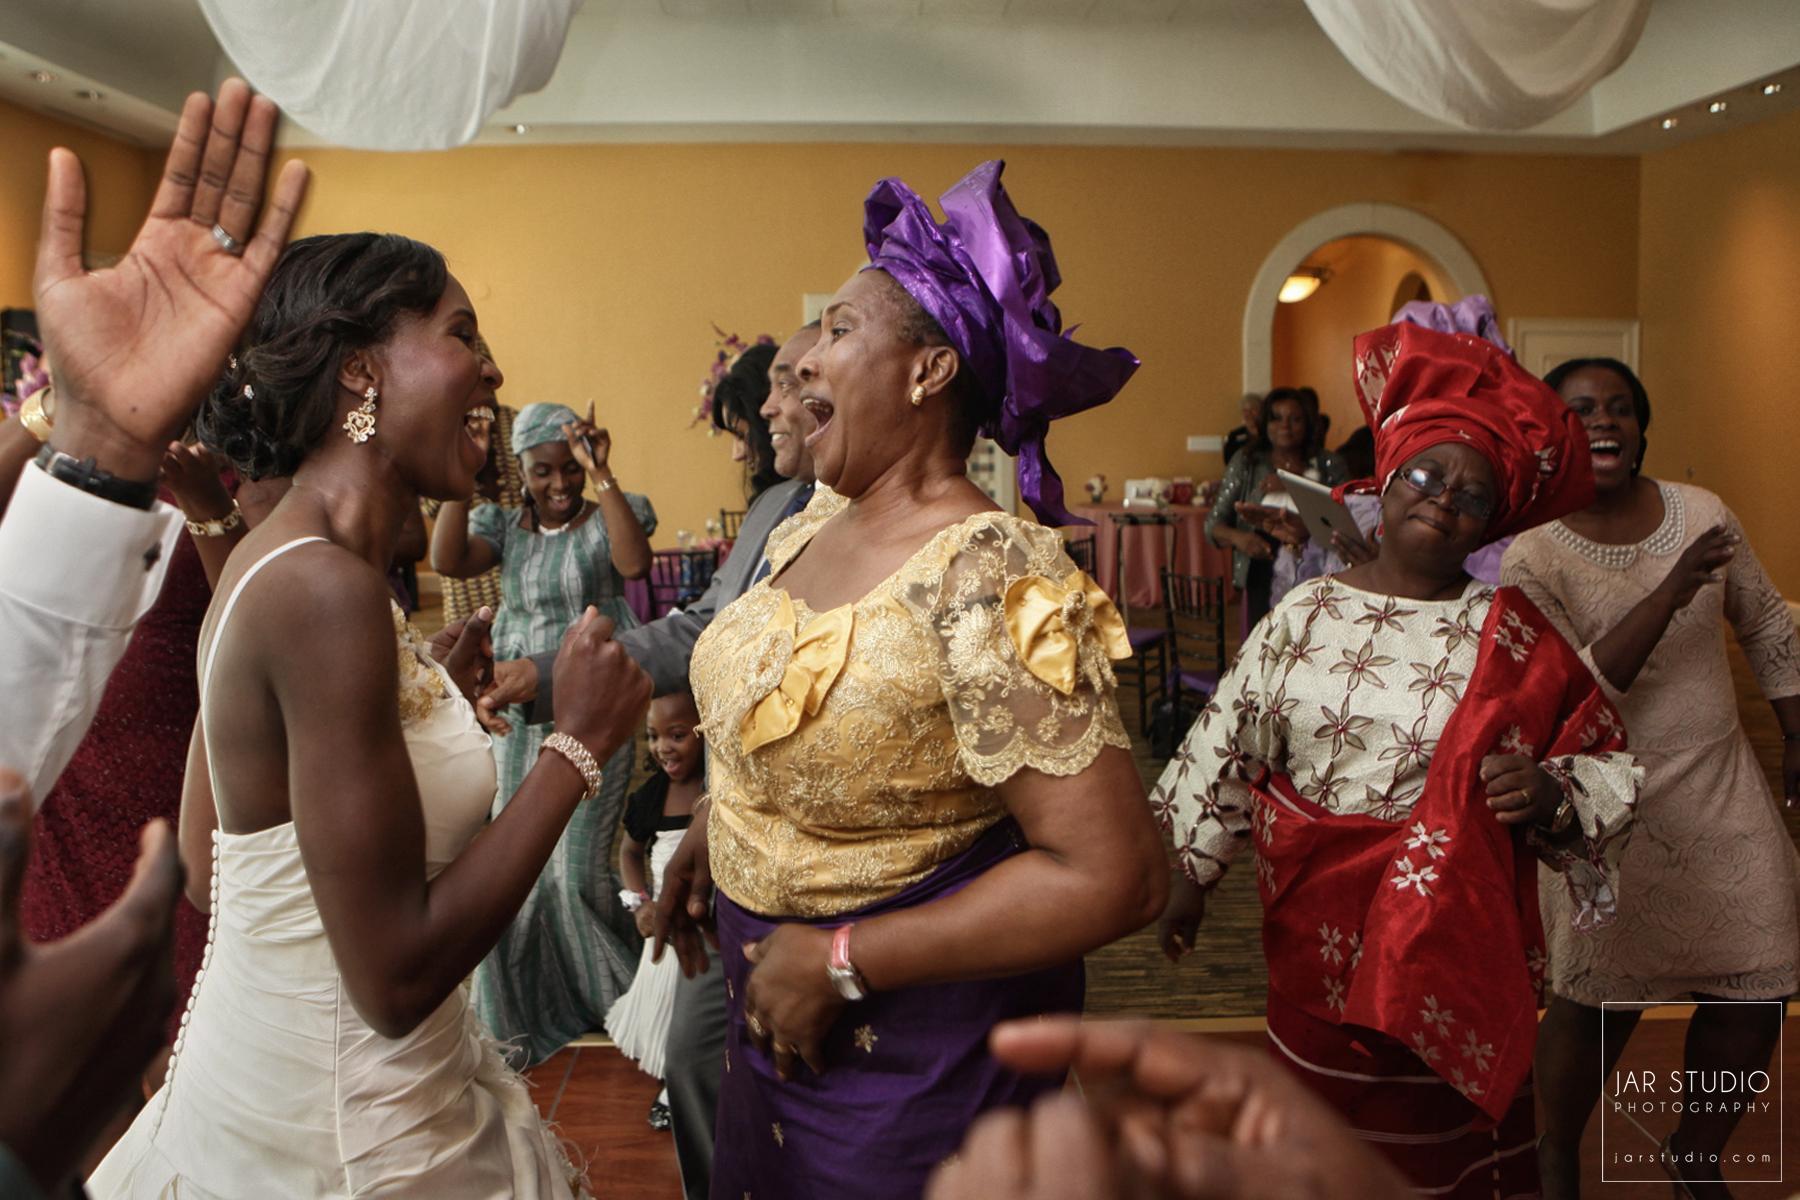 37-wedding-reception-fun-nigerian-style-orlando-fl-photographer.JPG